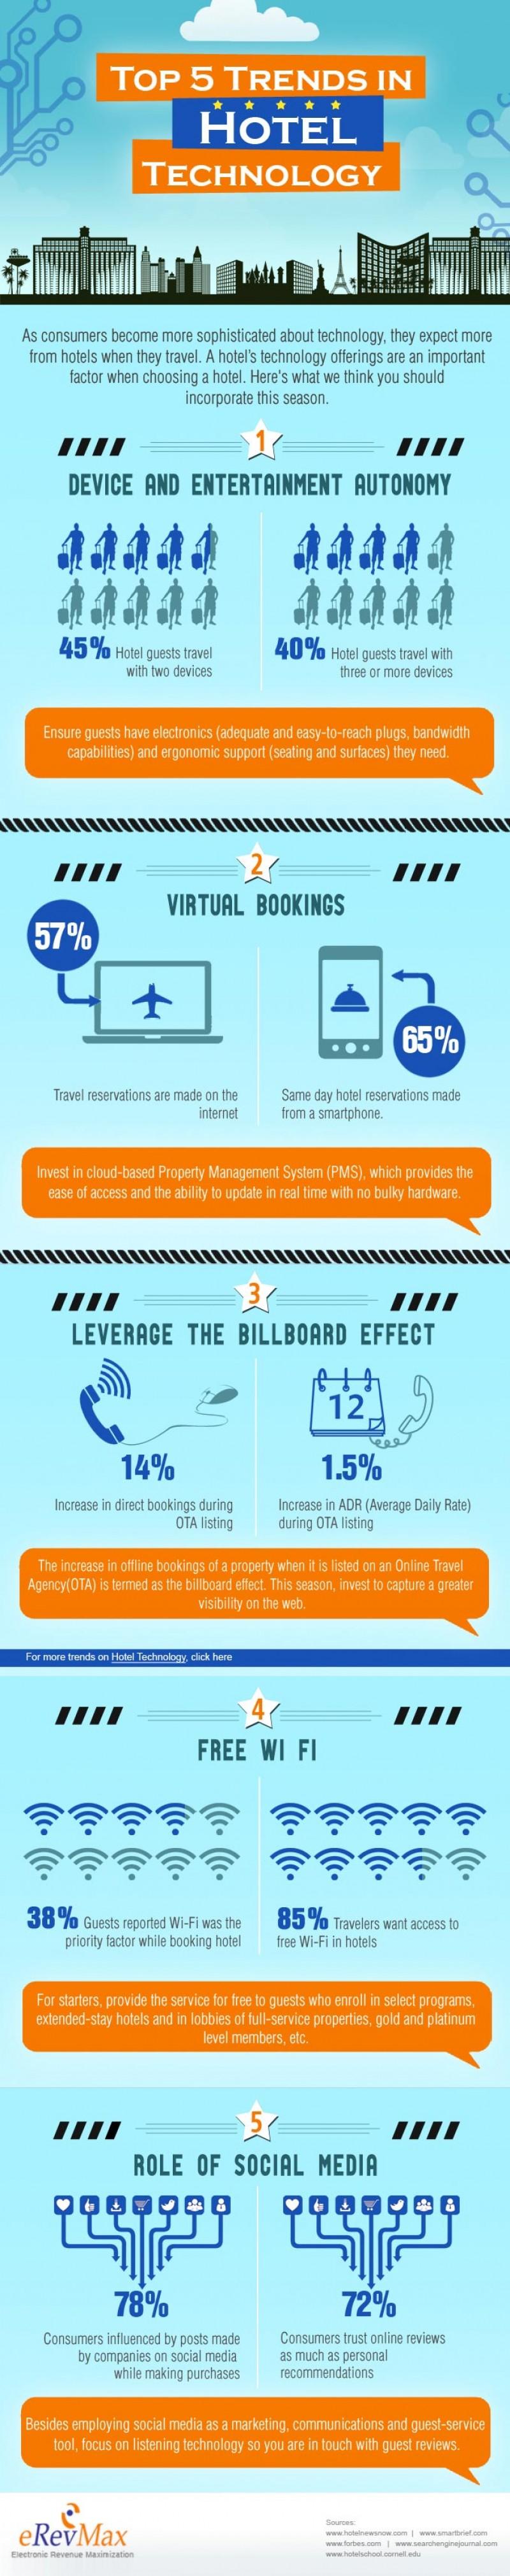 5 tendencias tecnológicas para hoteles